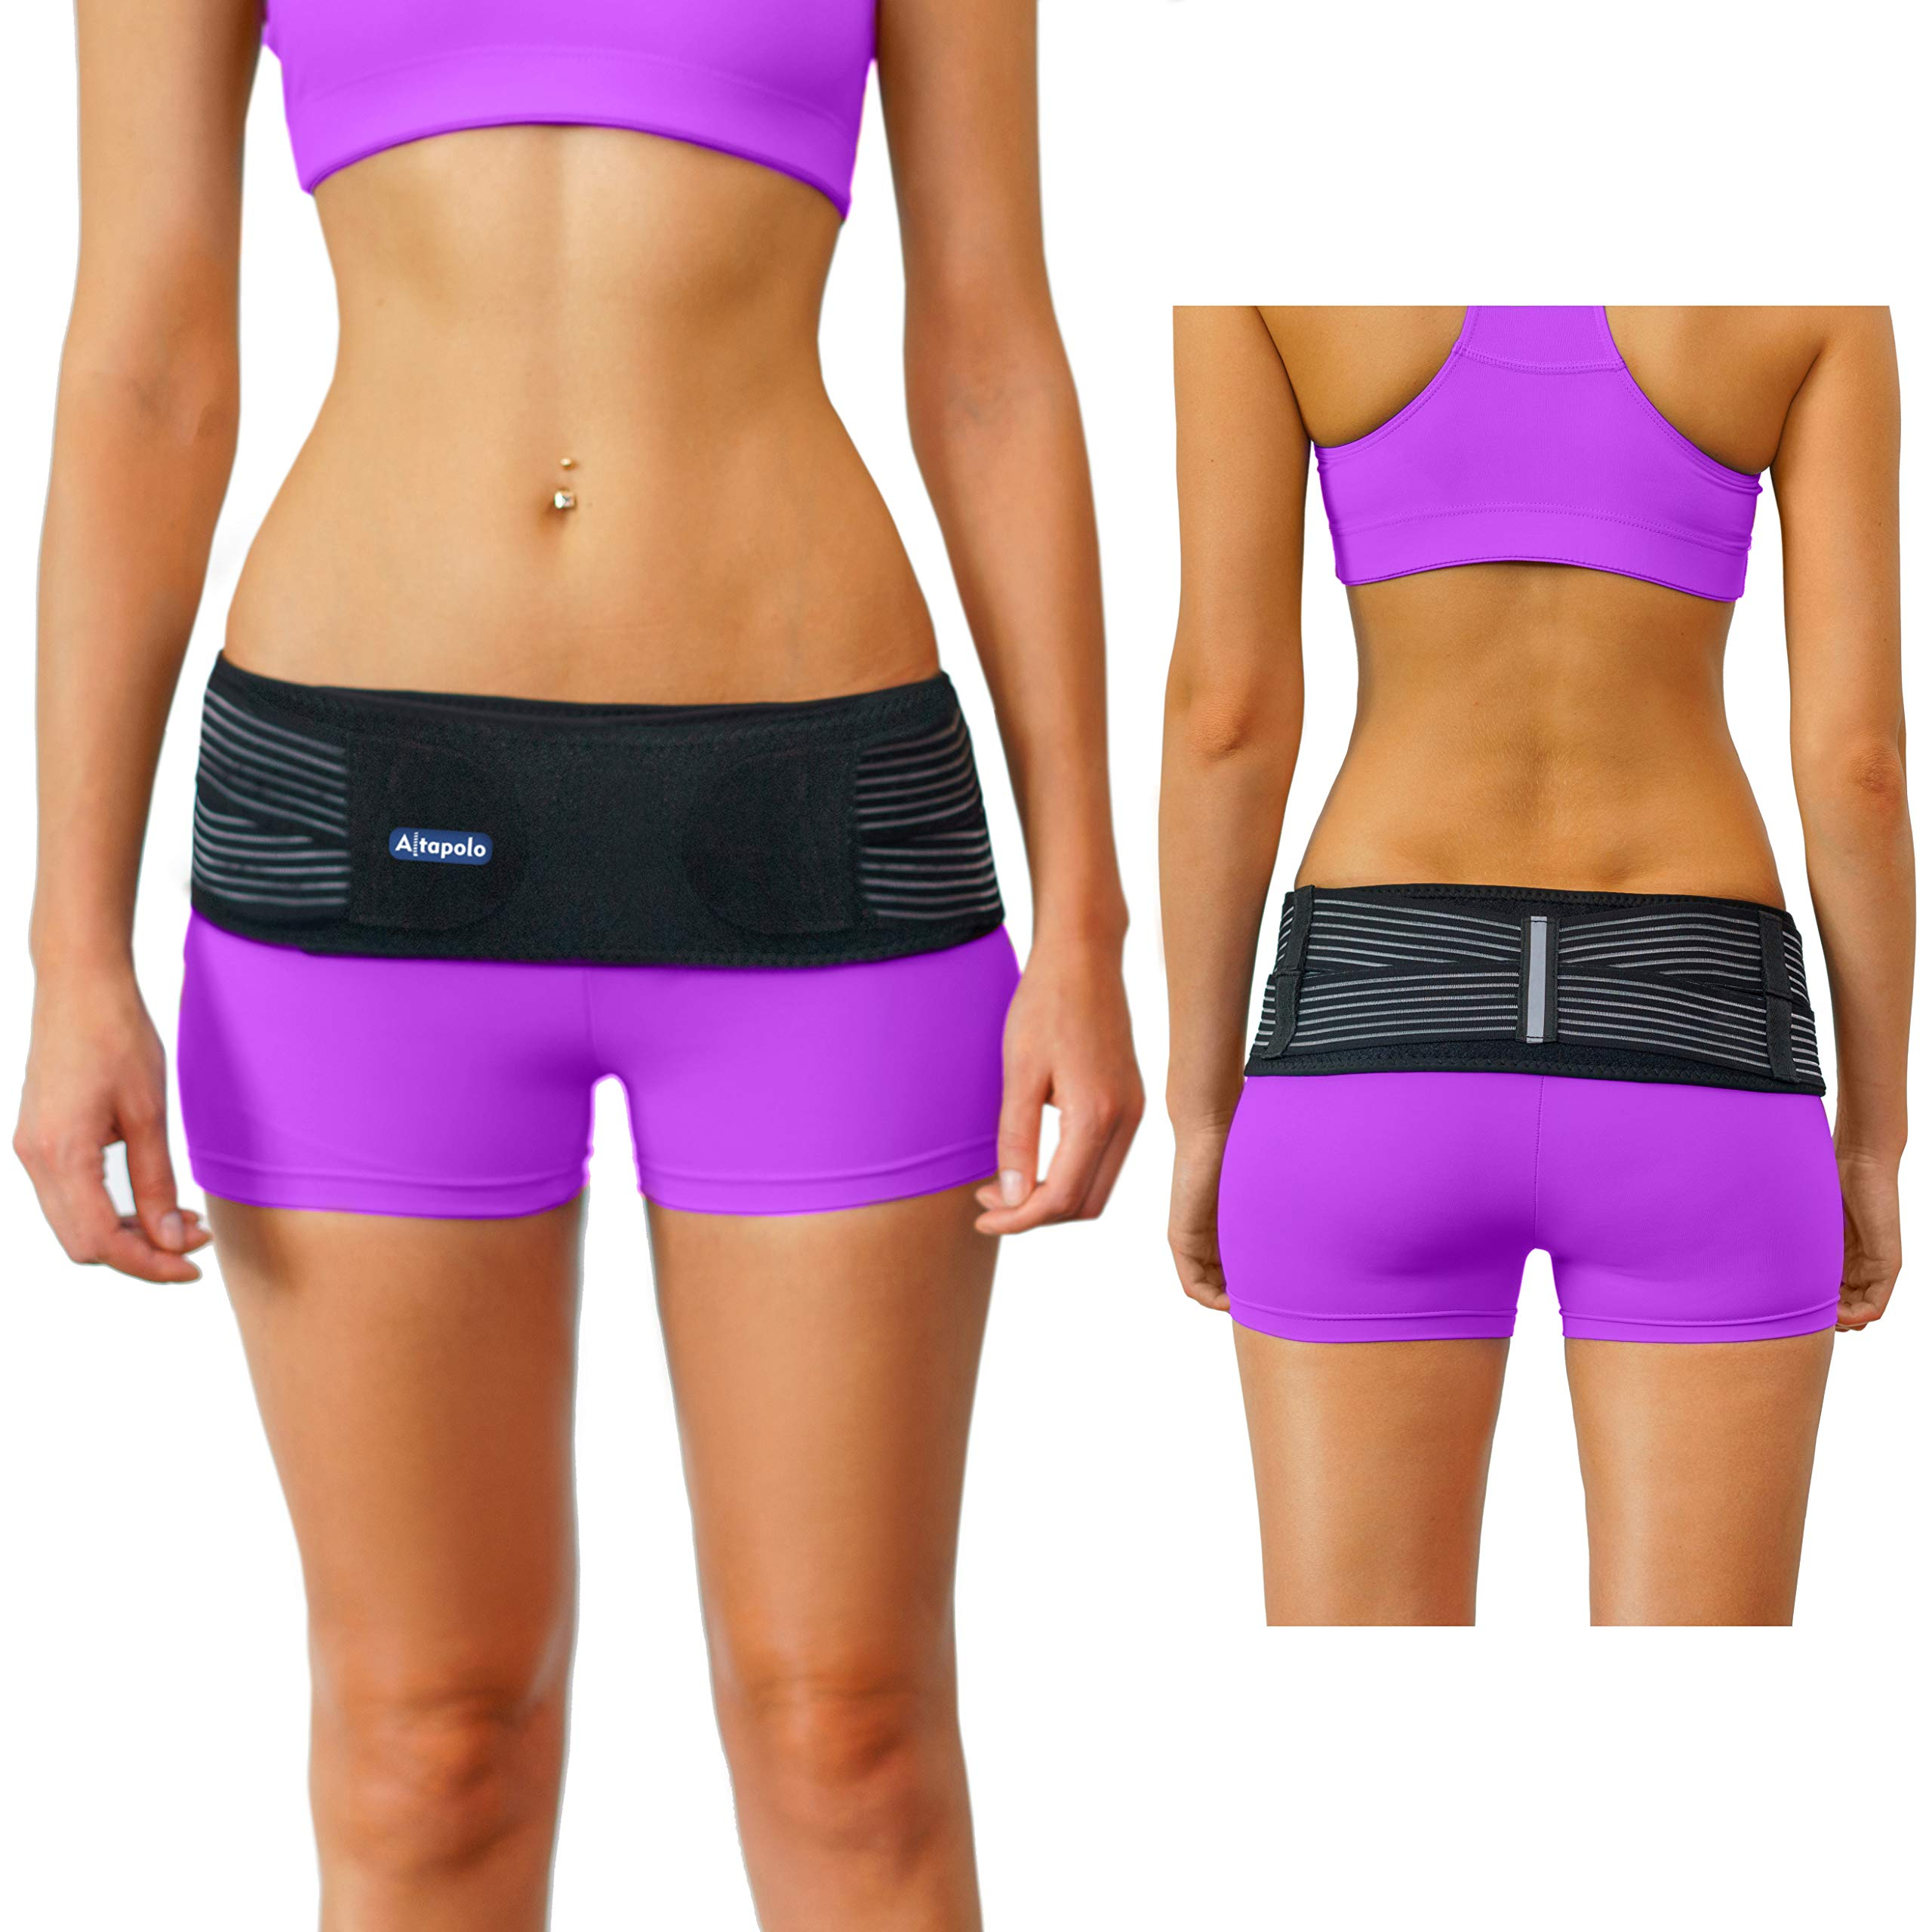 Altapolo Si Belt for Women and Men - Stabilizing Si Brace Alleviates Inflammation Sciatica Belt - Anti-Slip Si Joint Belt - Trochanter Sacroiliac Support Belt for Maximum Comfort